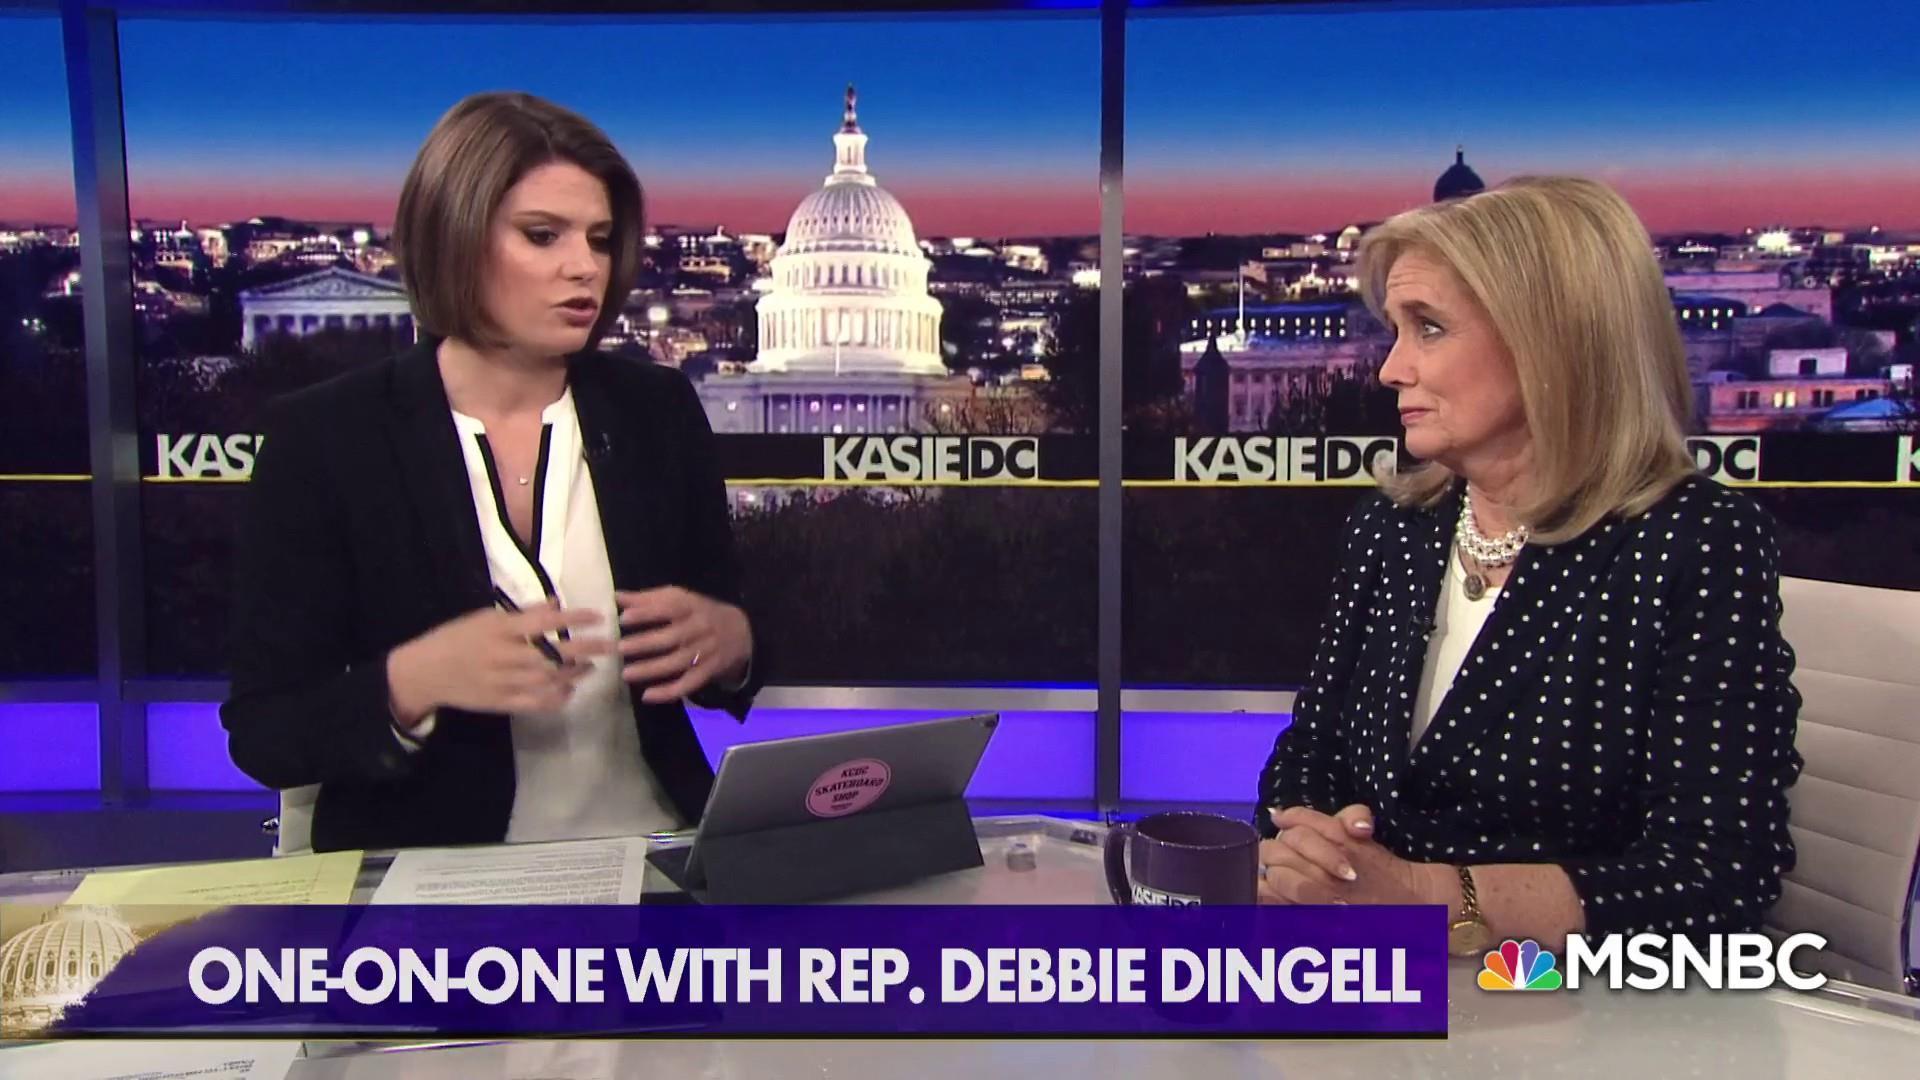 Rep  Debbie Dingell a 'Debbie Downer' on a Democratic midterm wave